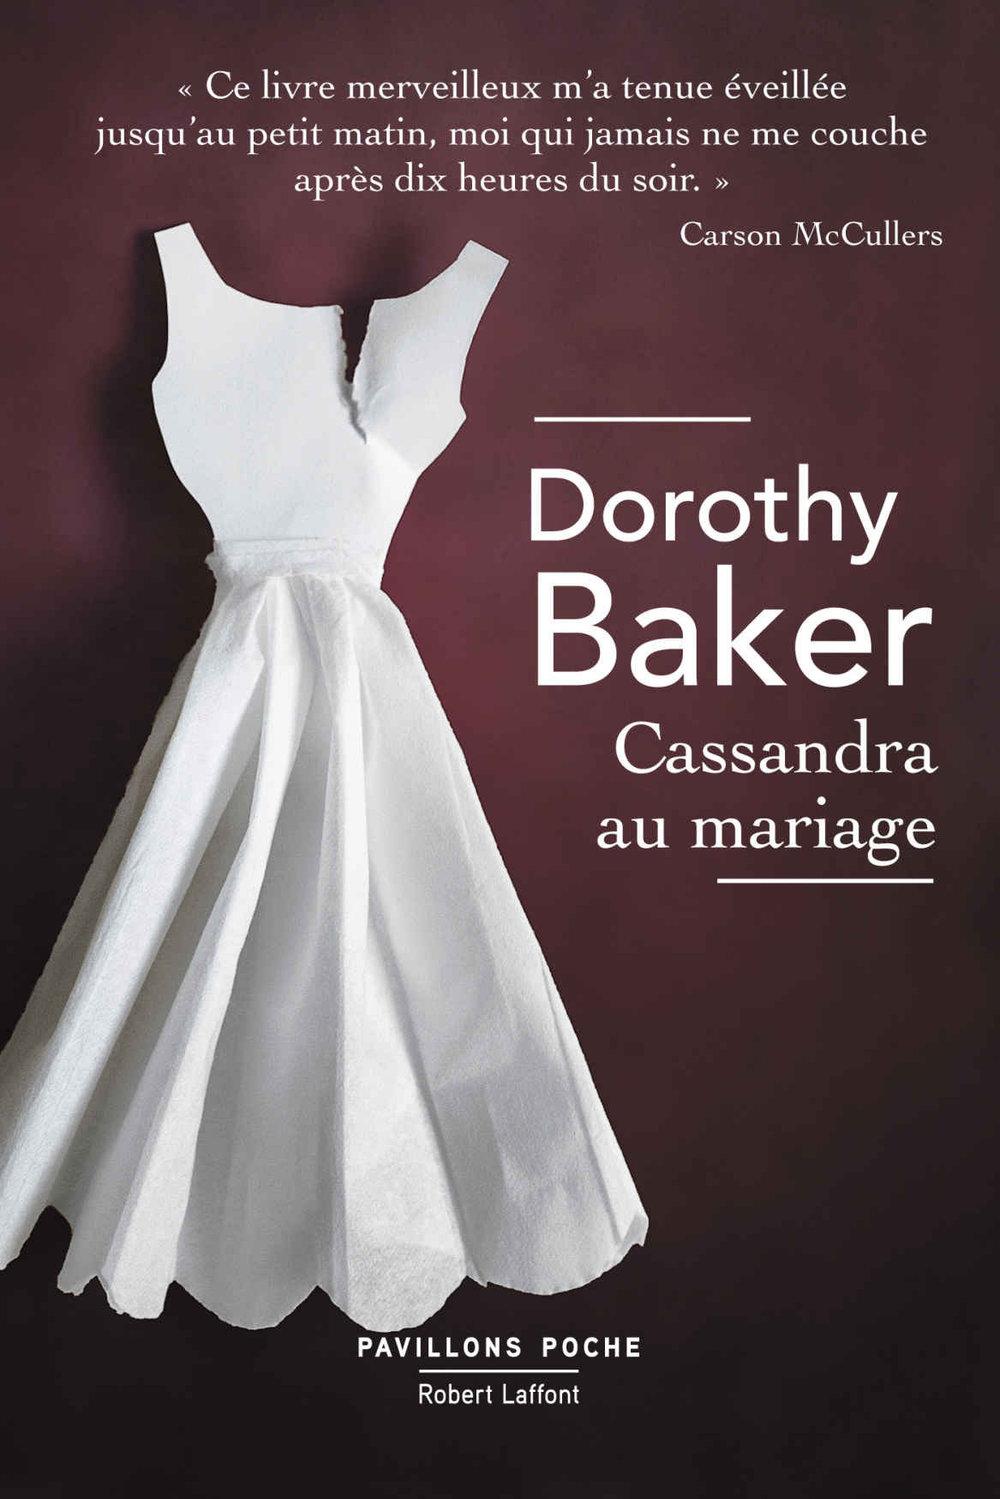 Cassandra au mariage.jpg